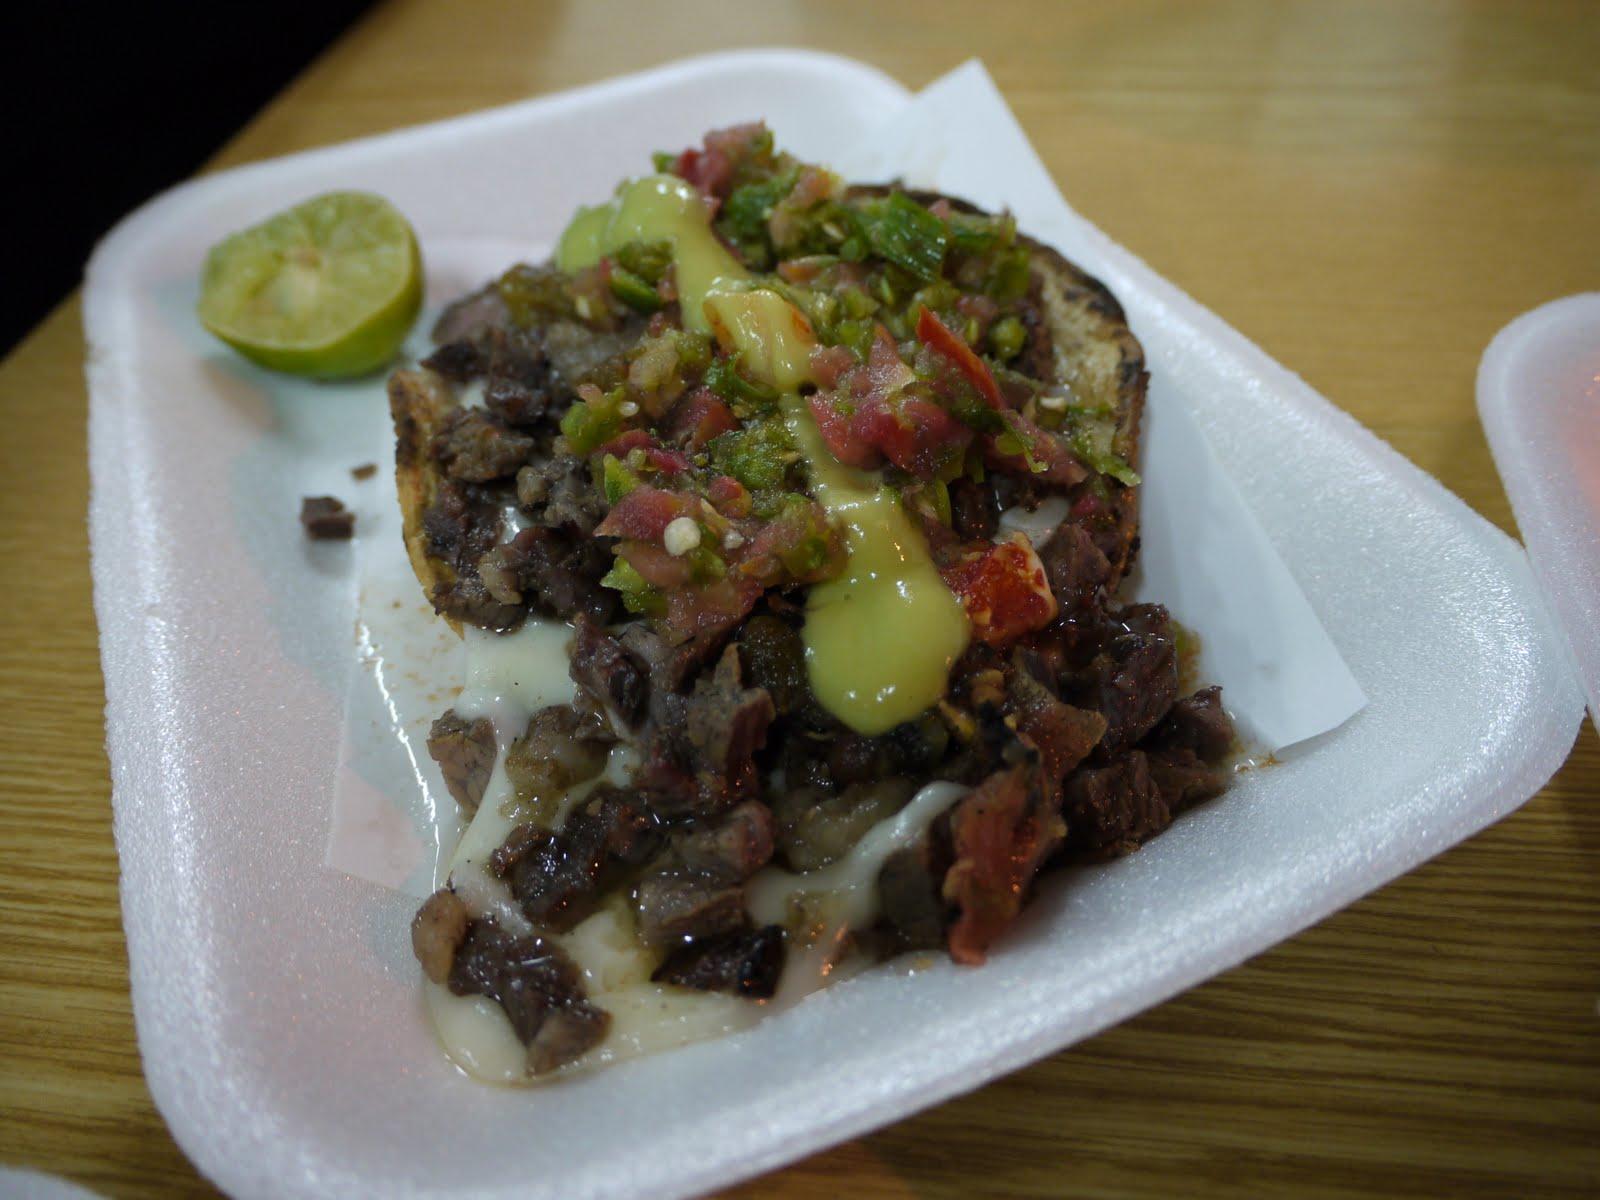 carne asada at carne asada cachetada carne asada taco vampiro ordinary ...